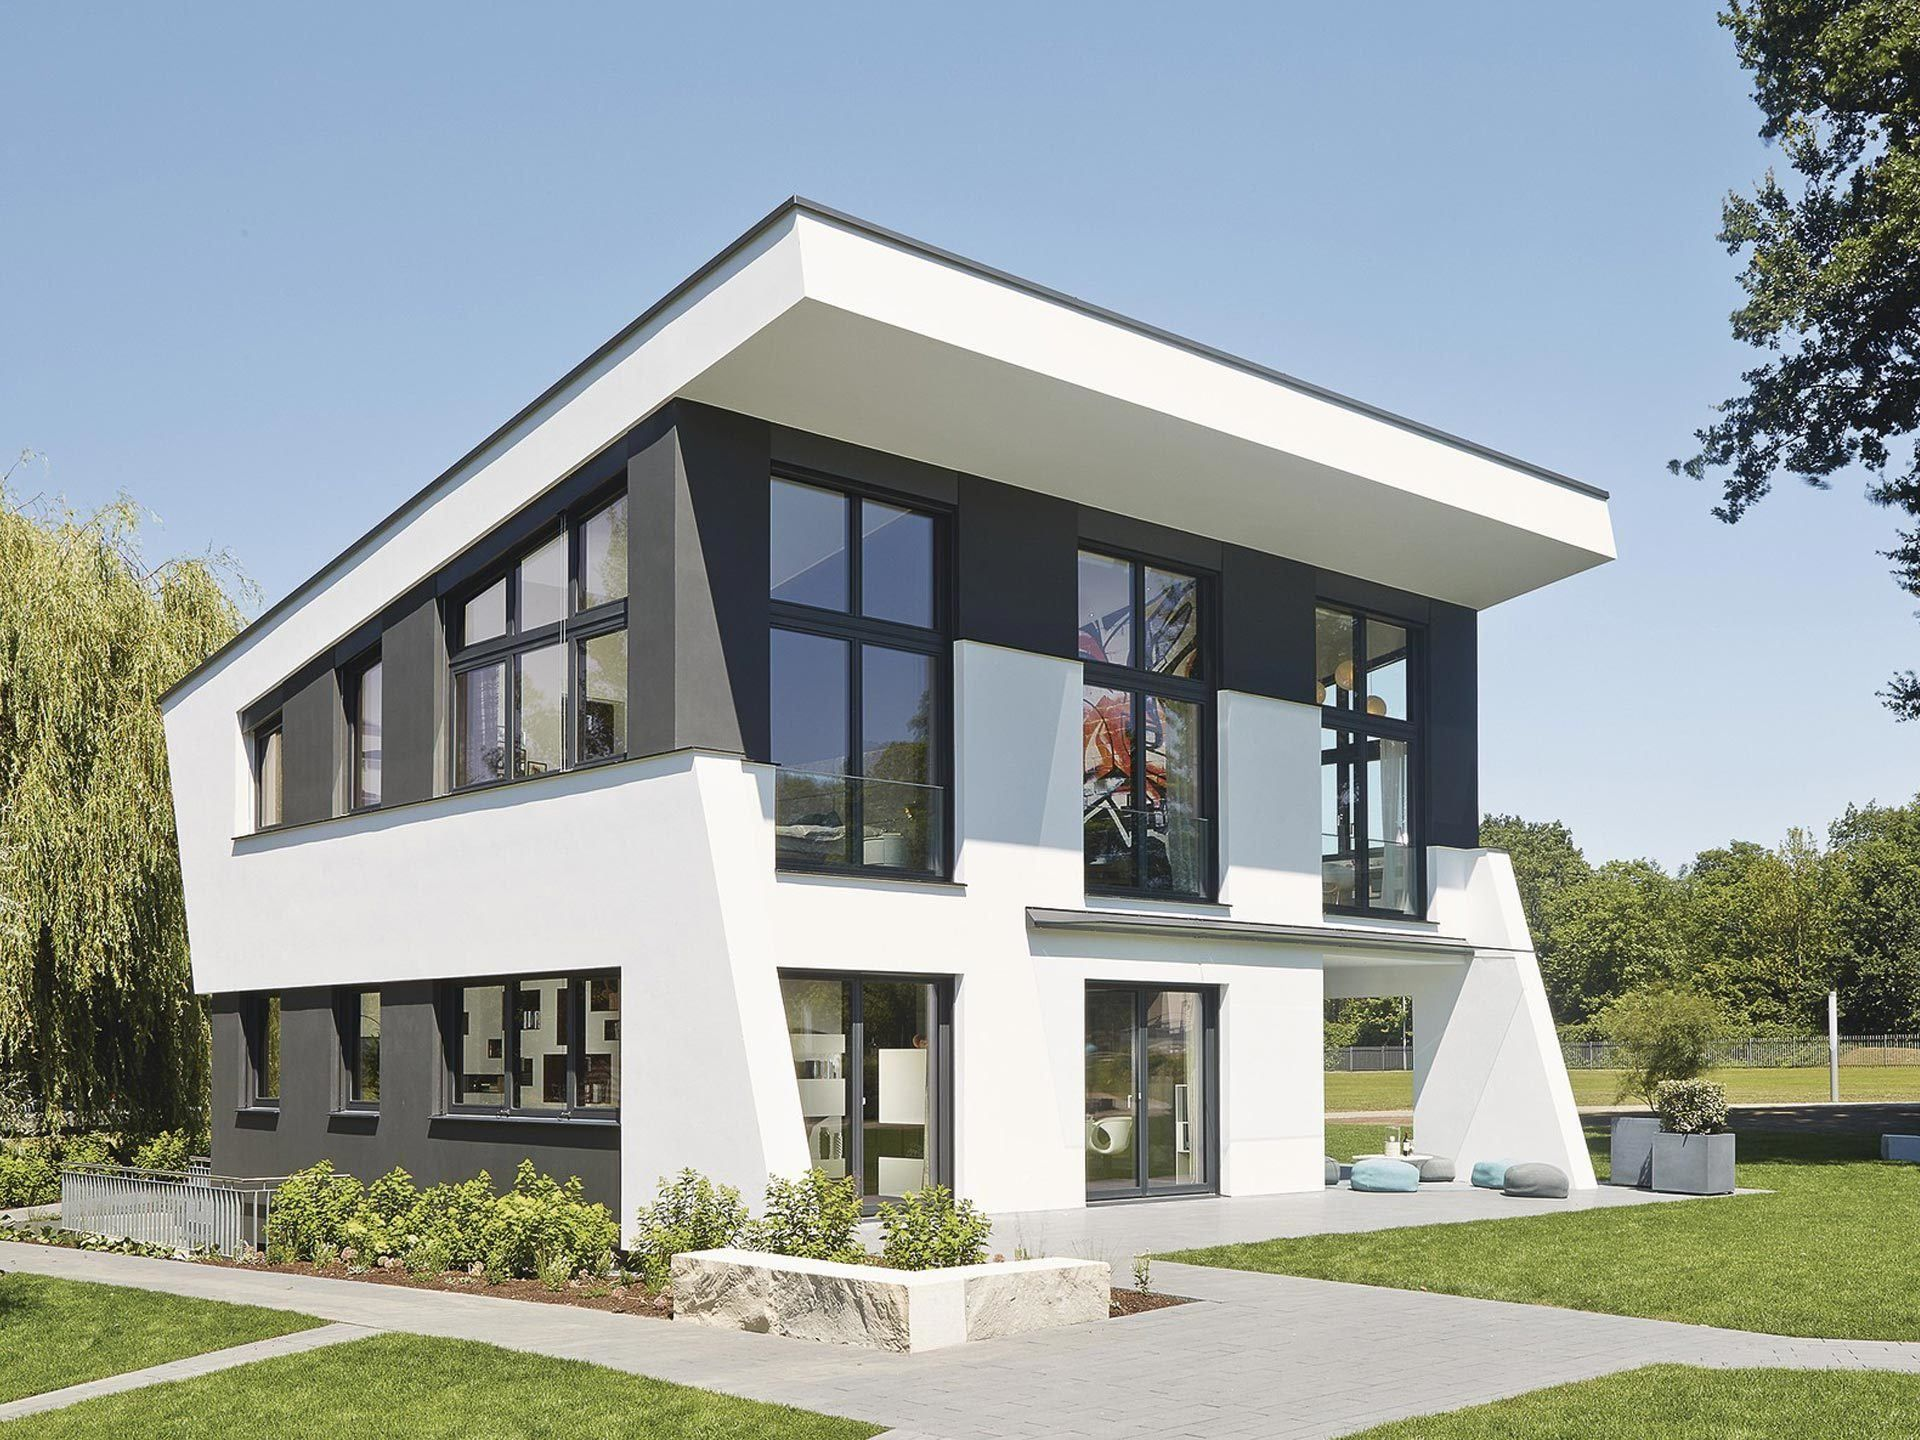 Ausstellungshaus rheinau linx jubil umshaus fertighaus for Einfamilienhaus modelle